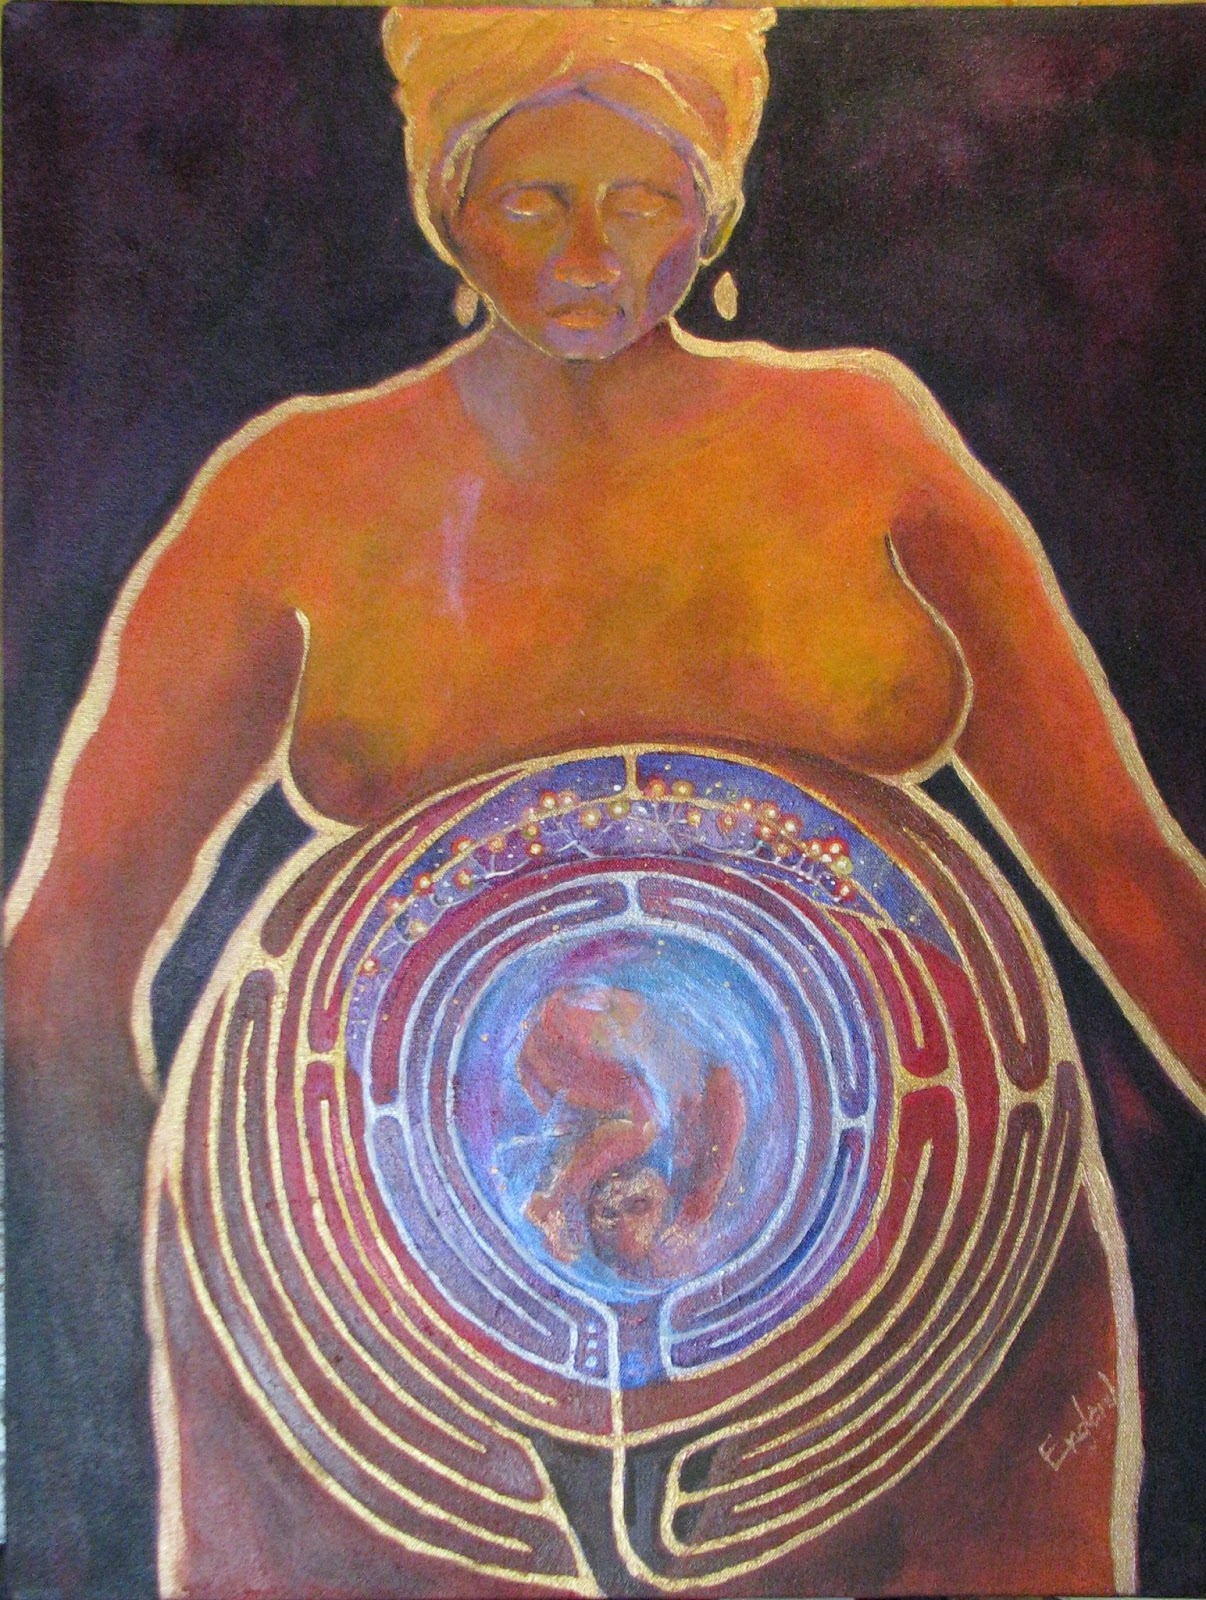 Photo credit:  https://birthpeeps.blogspot.com/2015/11/gestating-in-labyrinth-pam-england.html